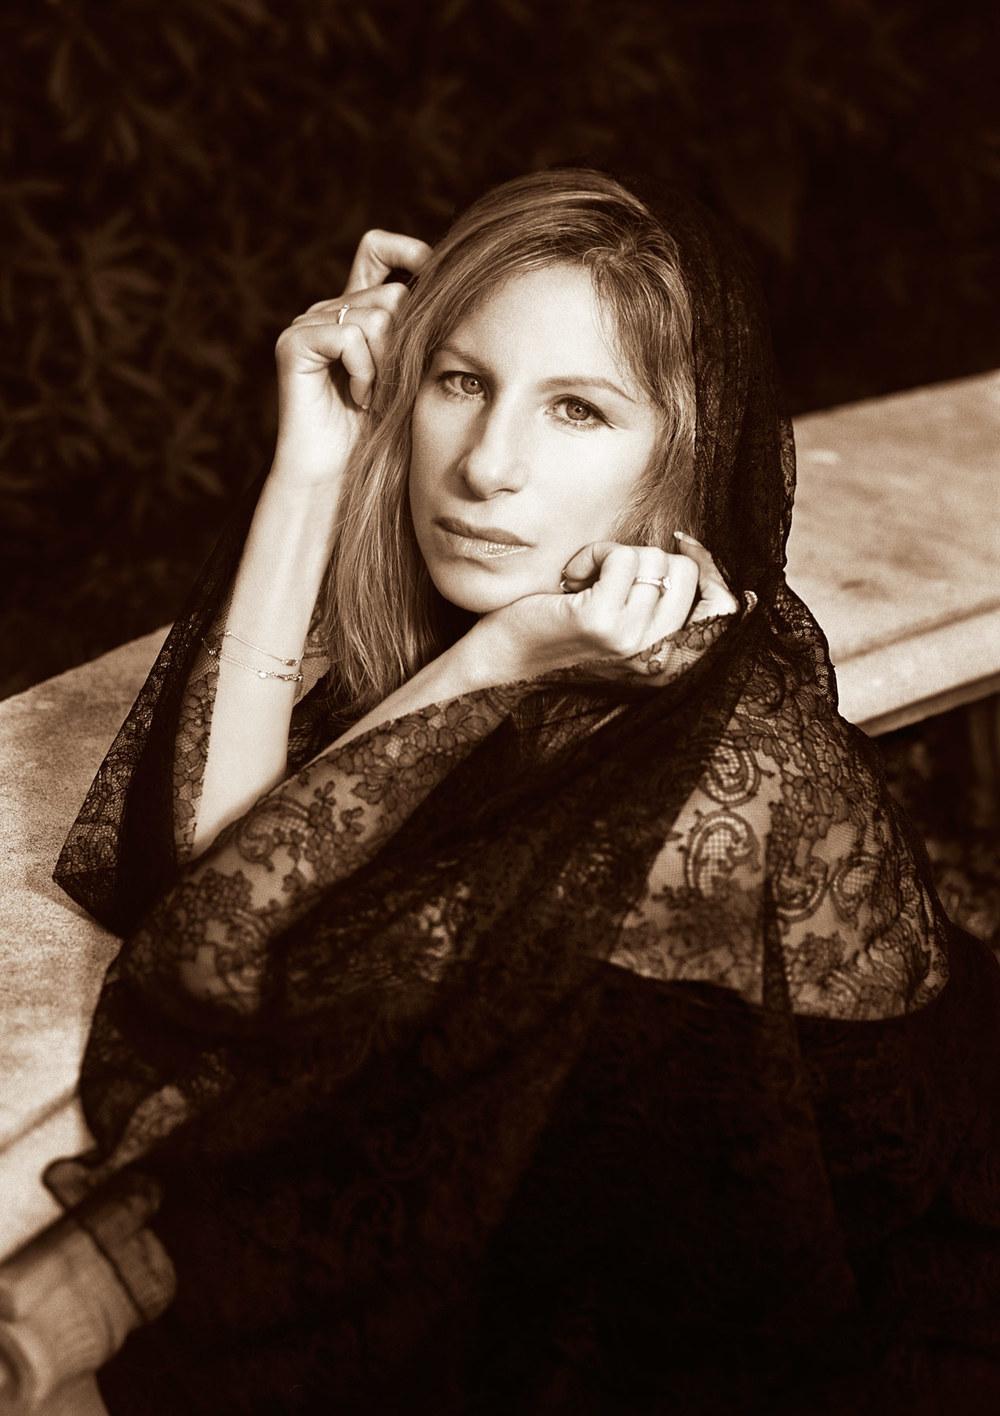 Barbara-Streisand-1375_048_006_p1a_p5.jpg